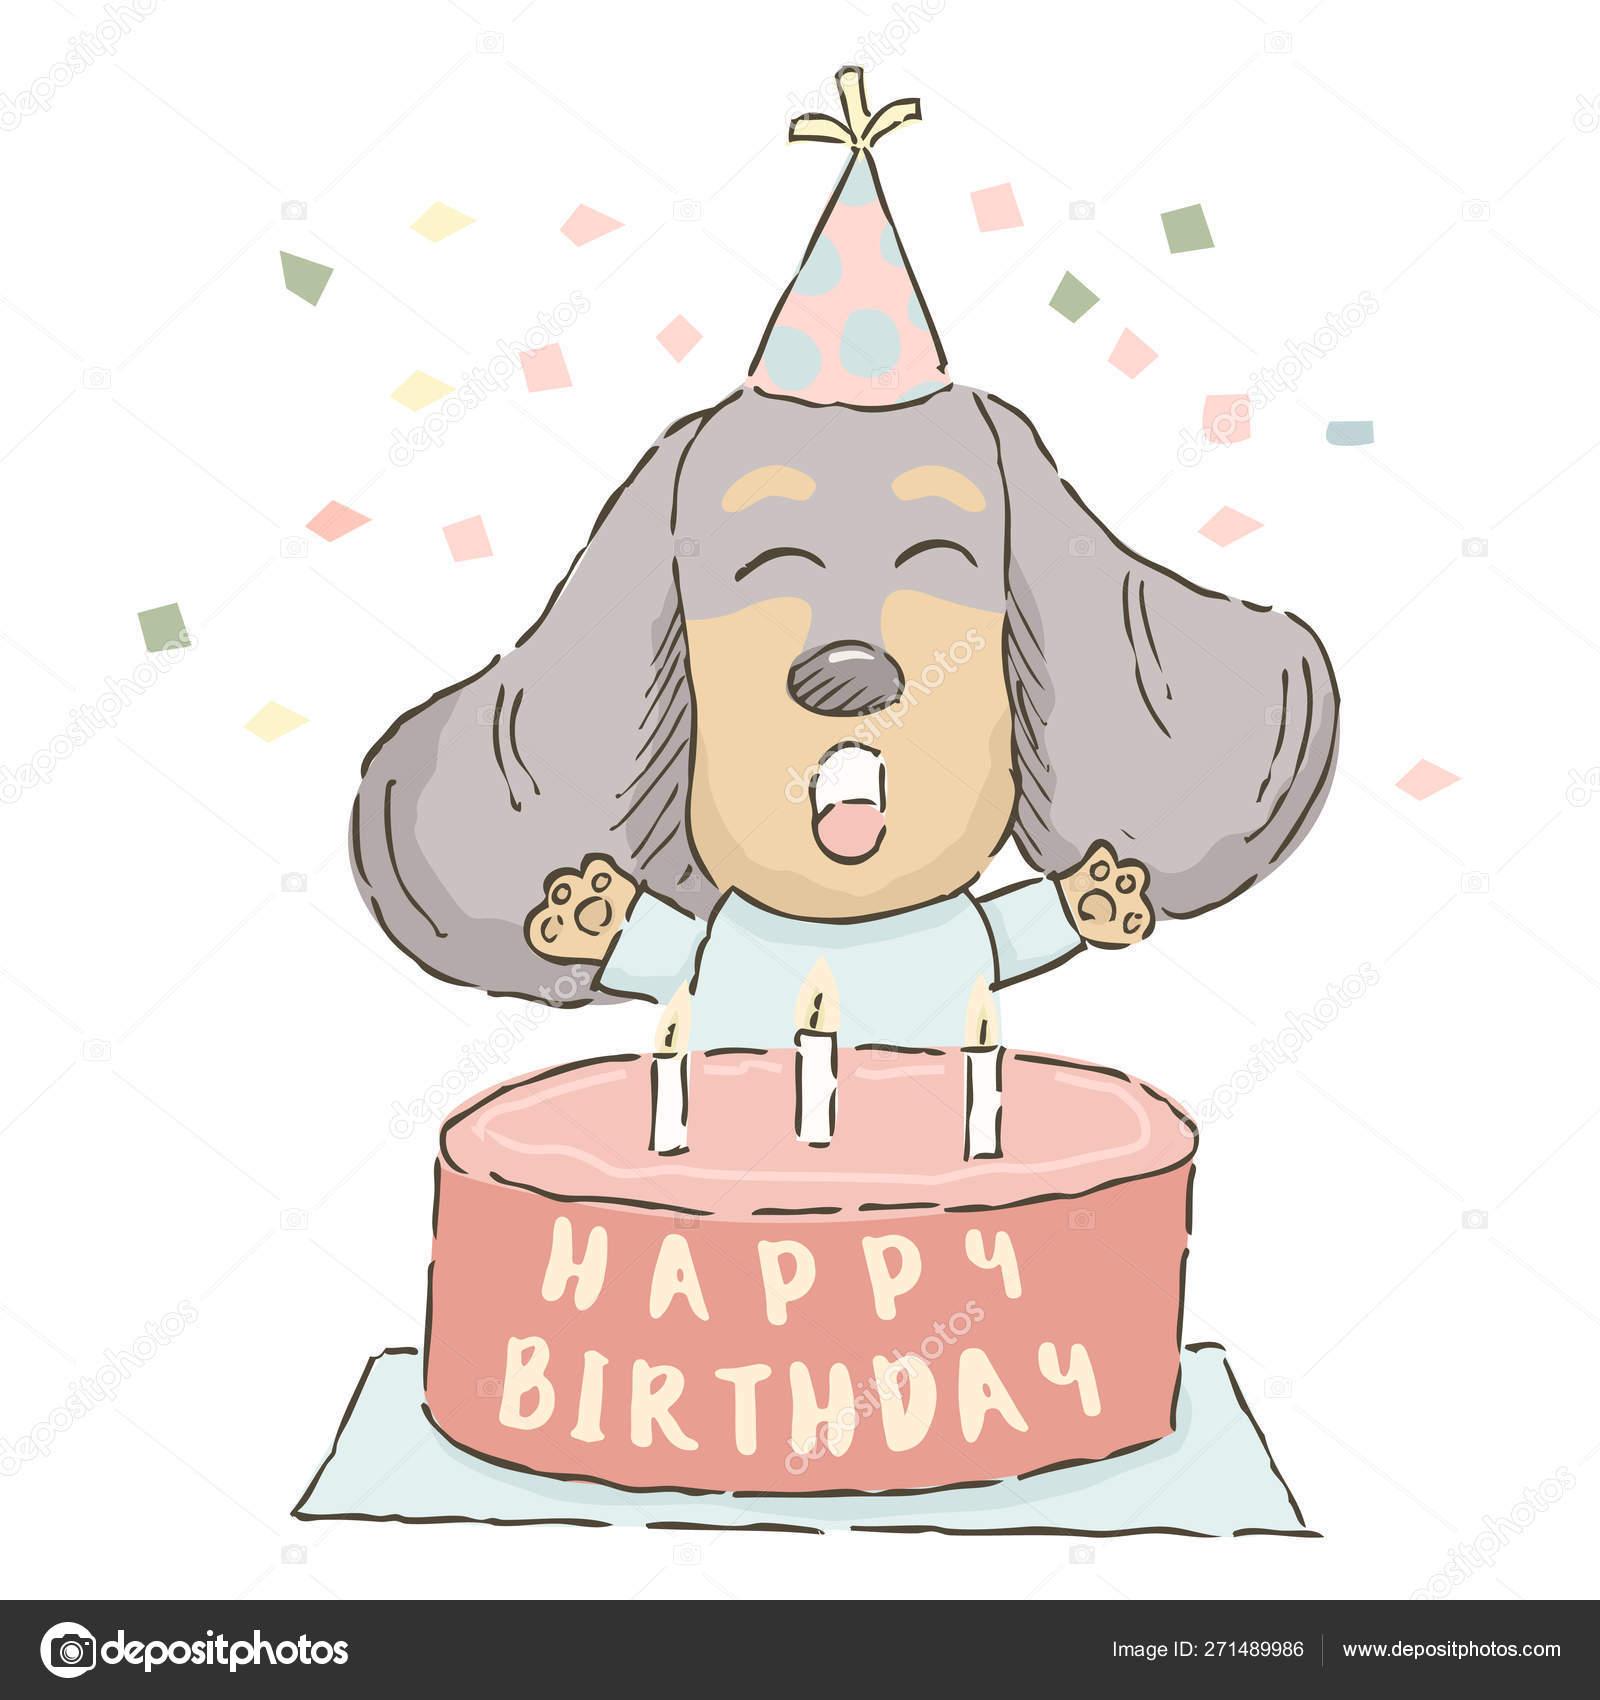 Pleasant Dachshund Birthday Cake Cute Cartoon Dachshund Birthday Cake Funny Birthday Cards Online Unhofree Goldxyz